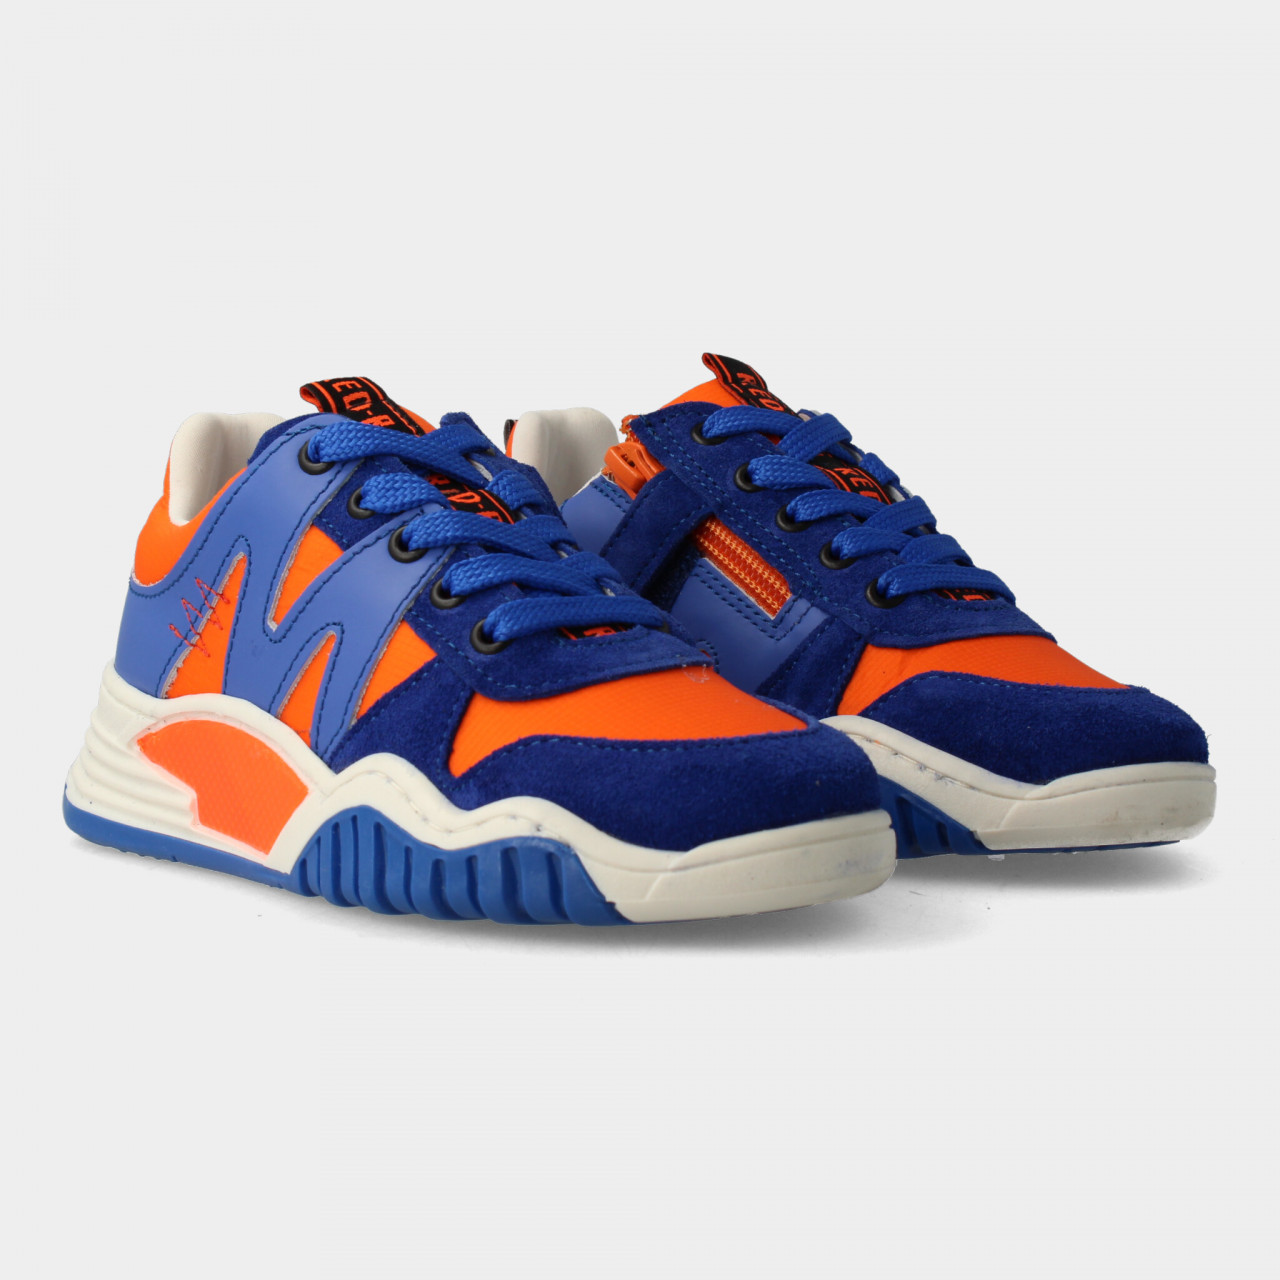 13433 | Boys Low Cut Sneaker Laces